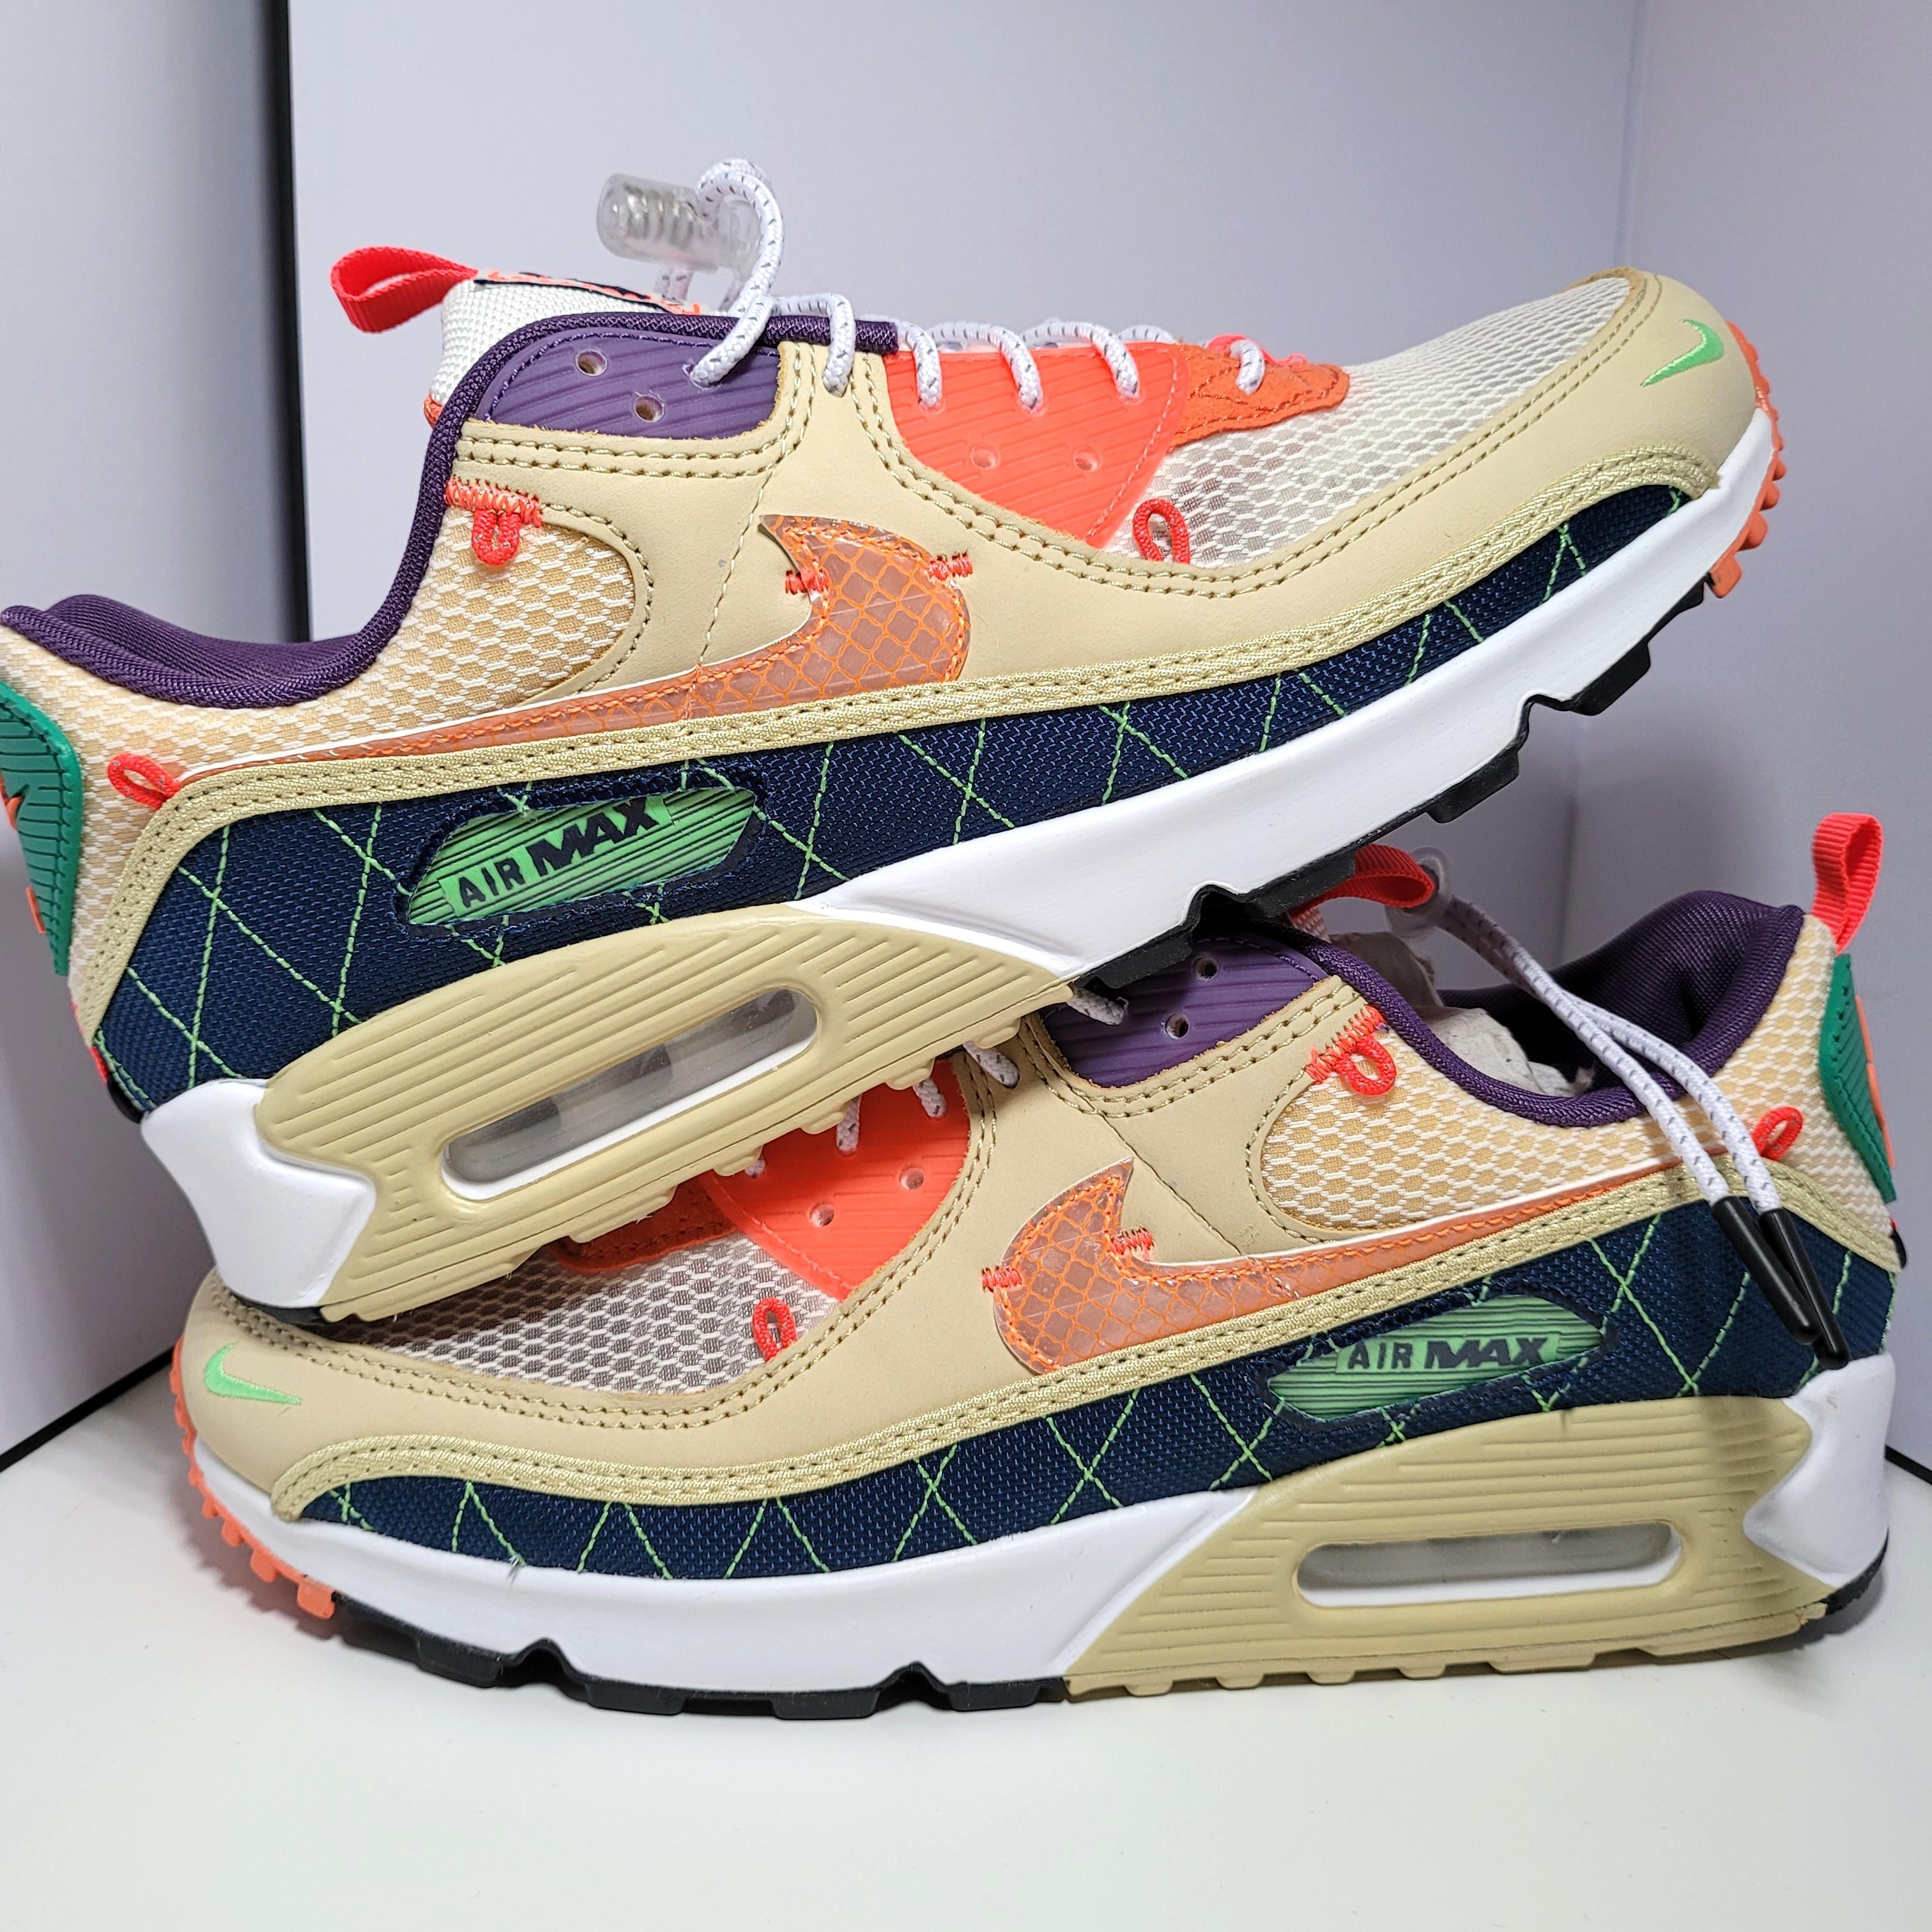 US 9.5) Nike Air Max 90 Trail Vibes, Men's Fashion, Footwear ...